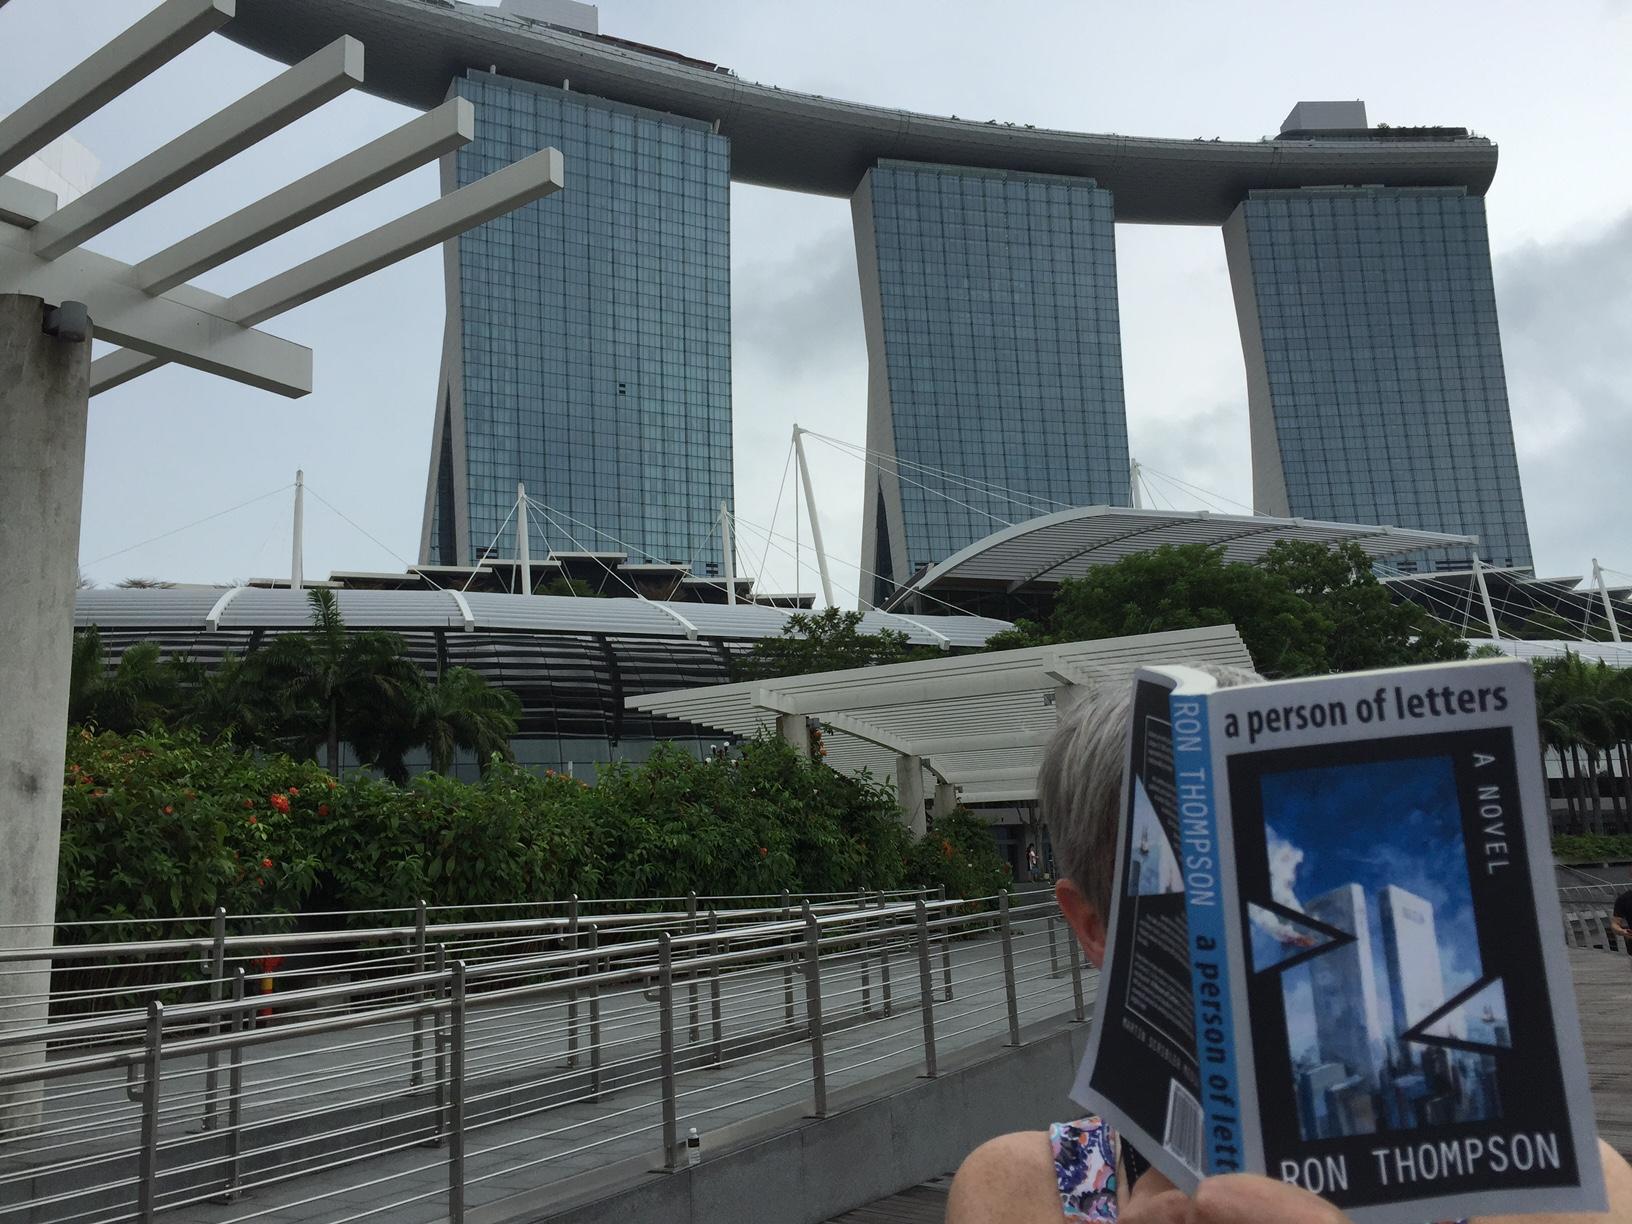 APOL Singapore, LesleyA reading, Sands in bkgrd